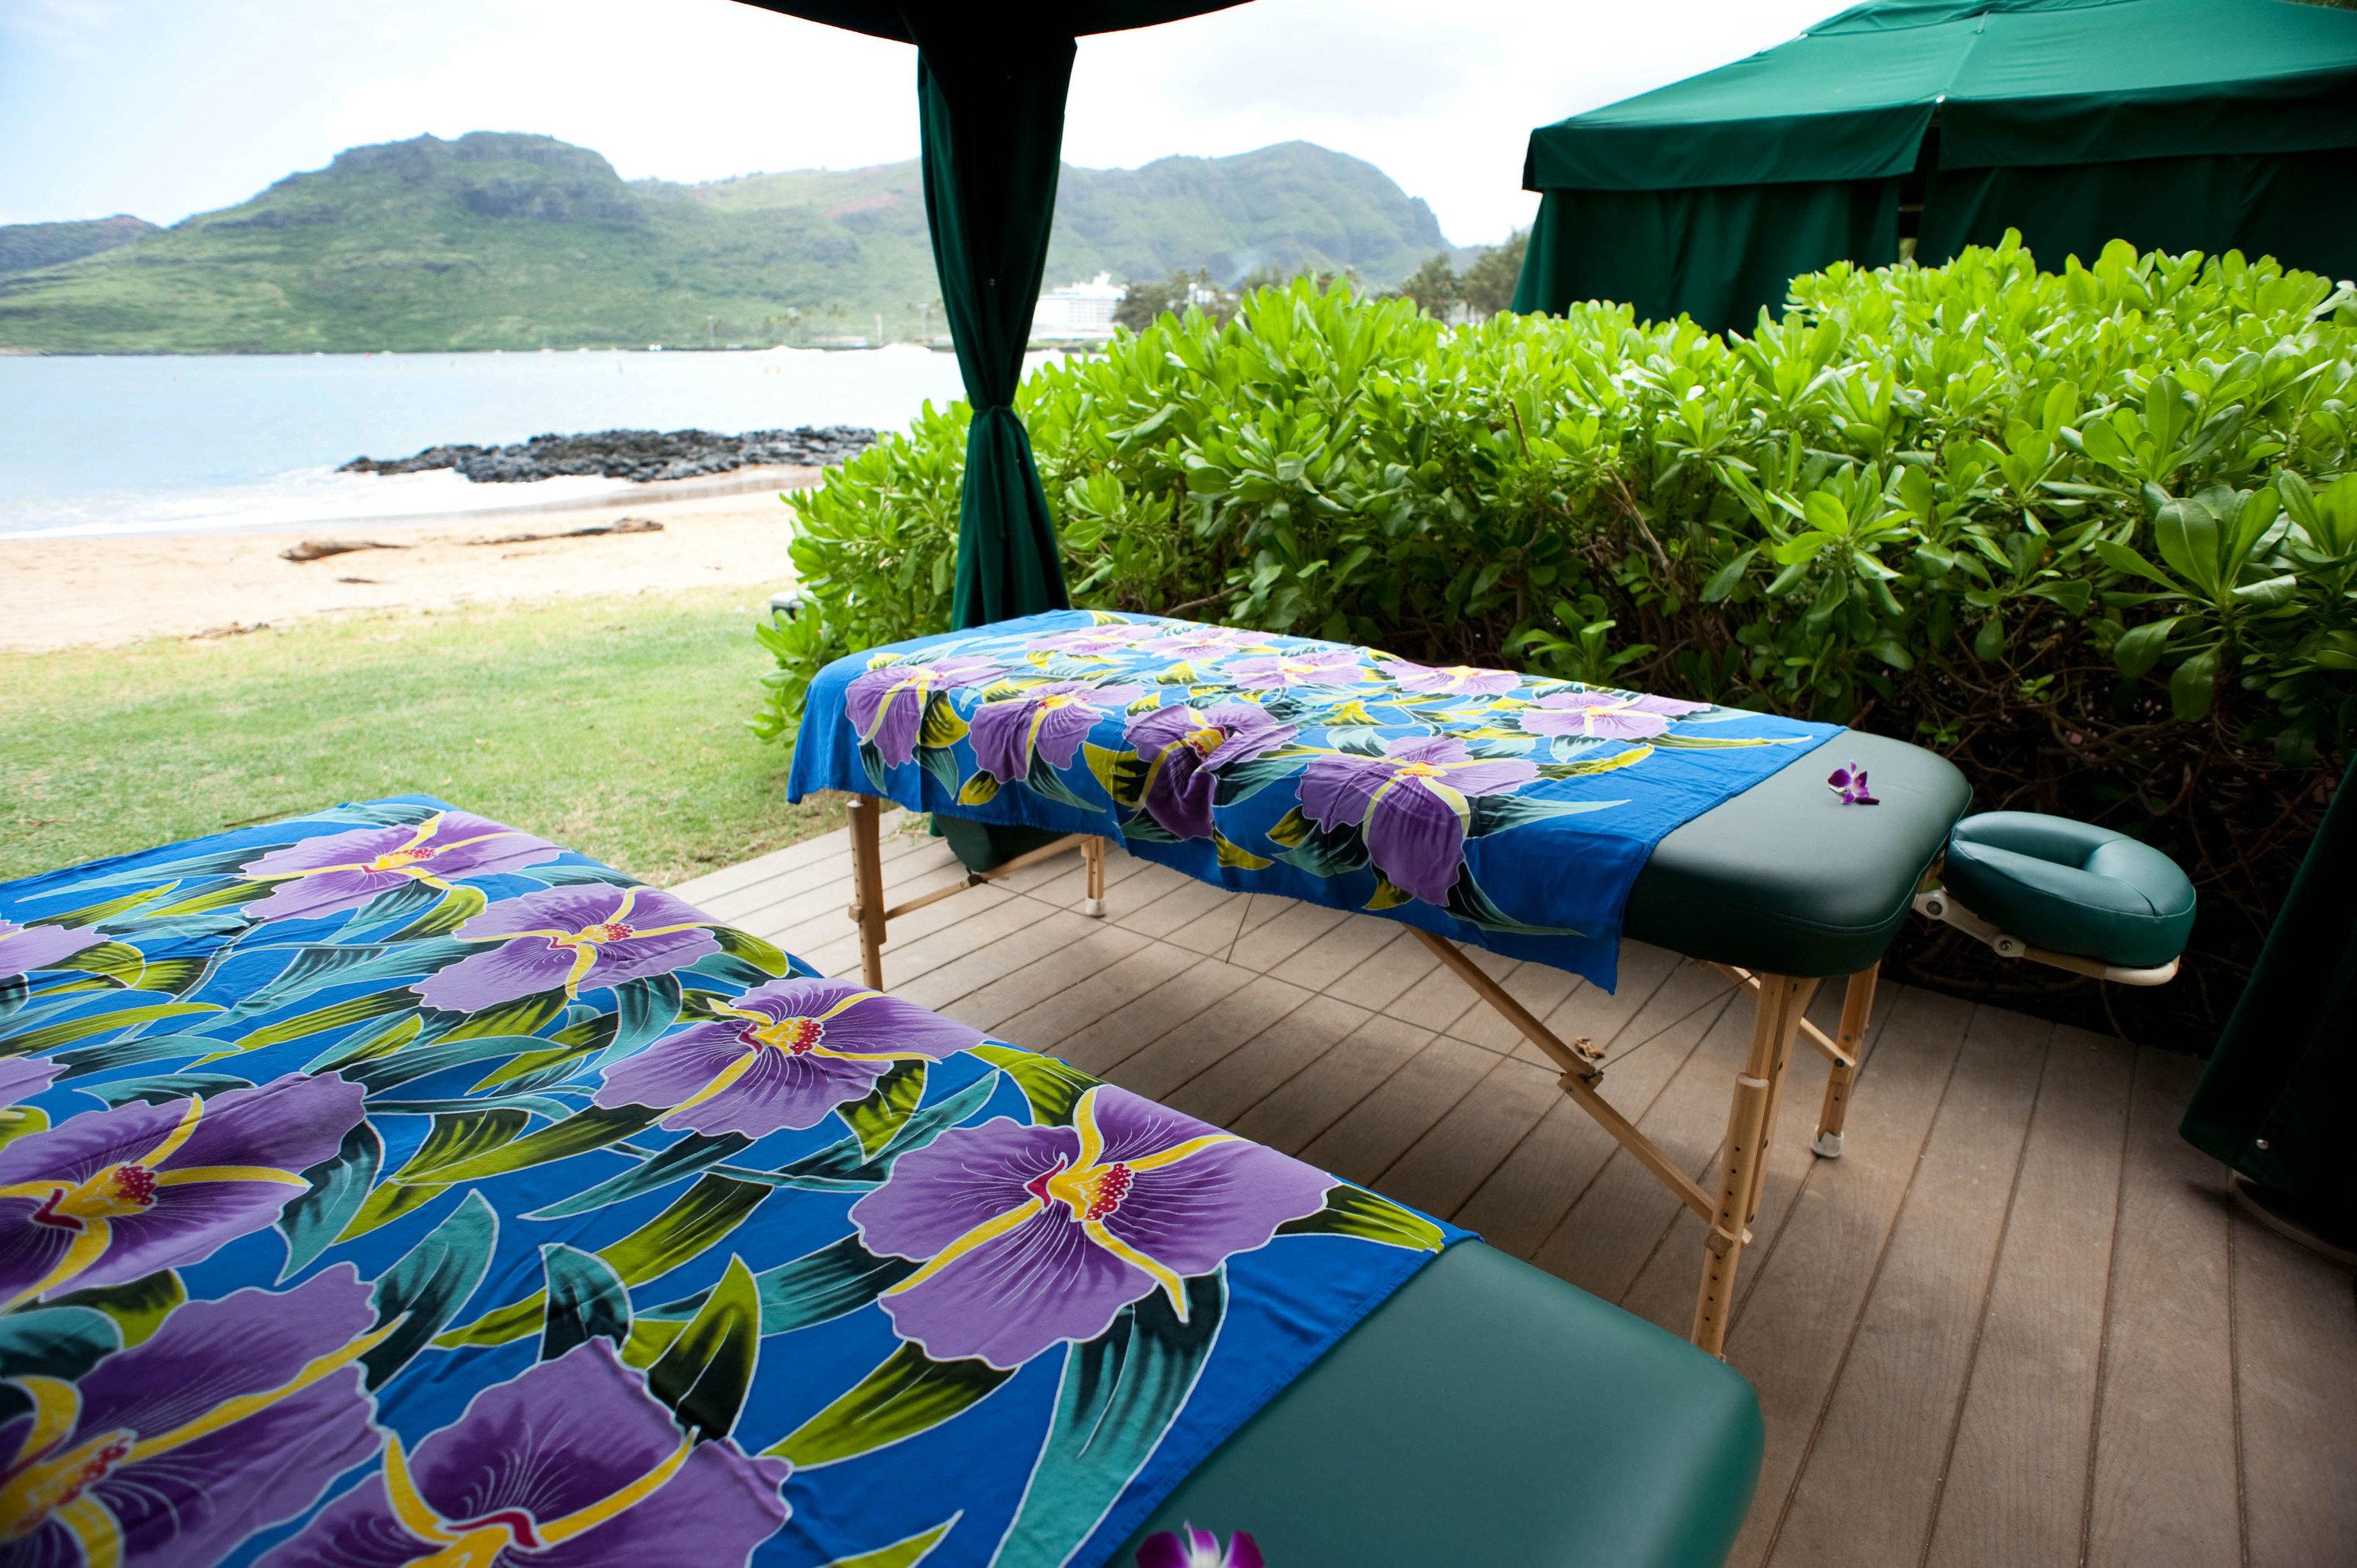 leisure swimming pool Resort backyard colorful colored